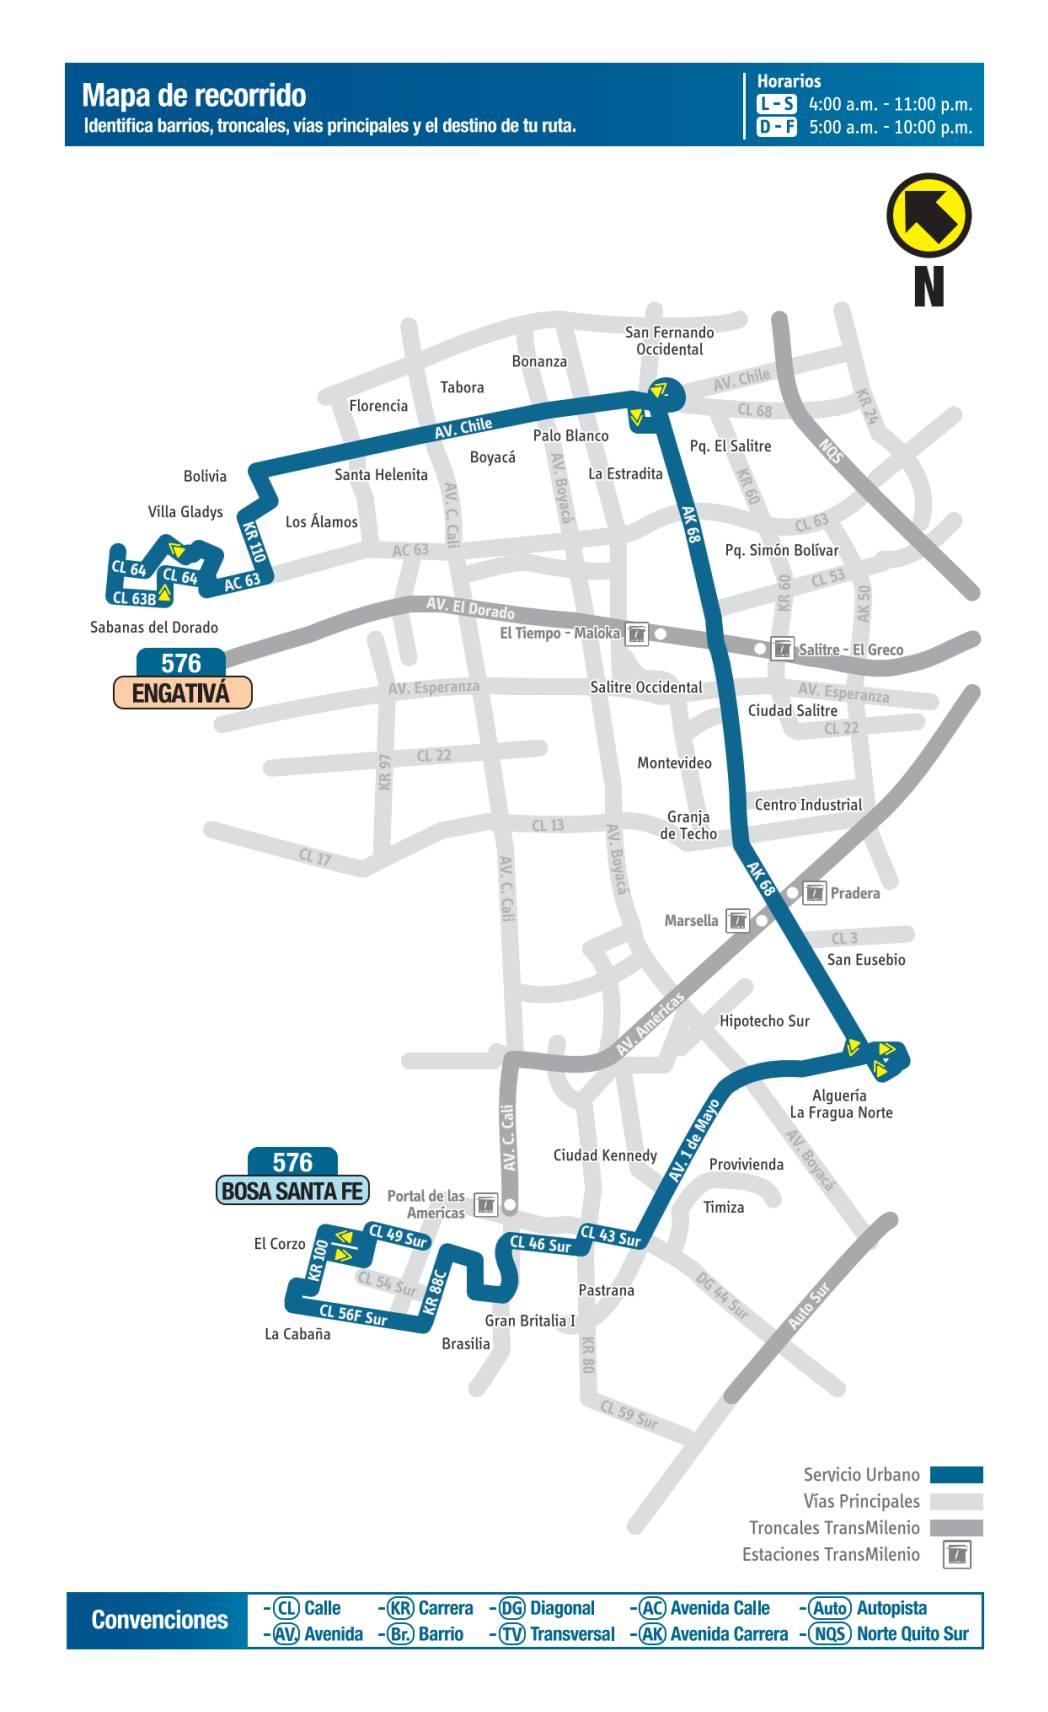 576 Bosa, Santa Fe - Engativá, mapa bus urbano Bogotá